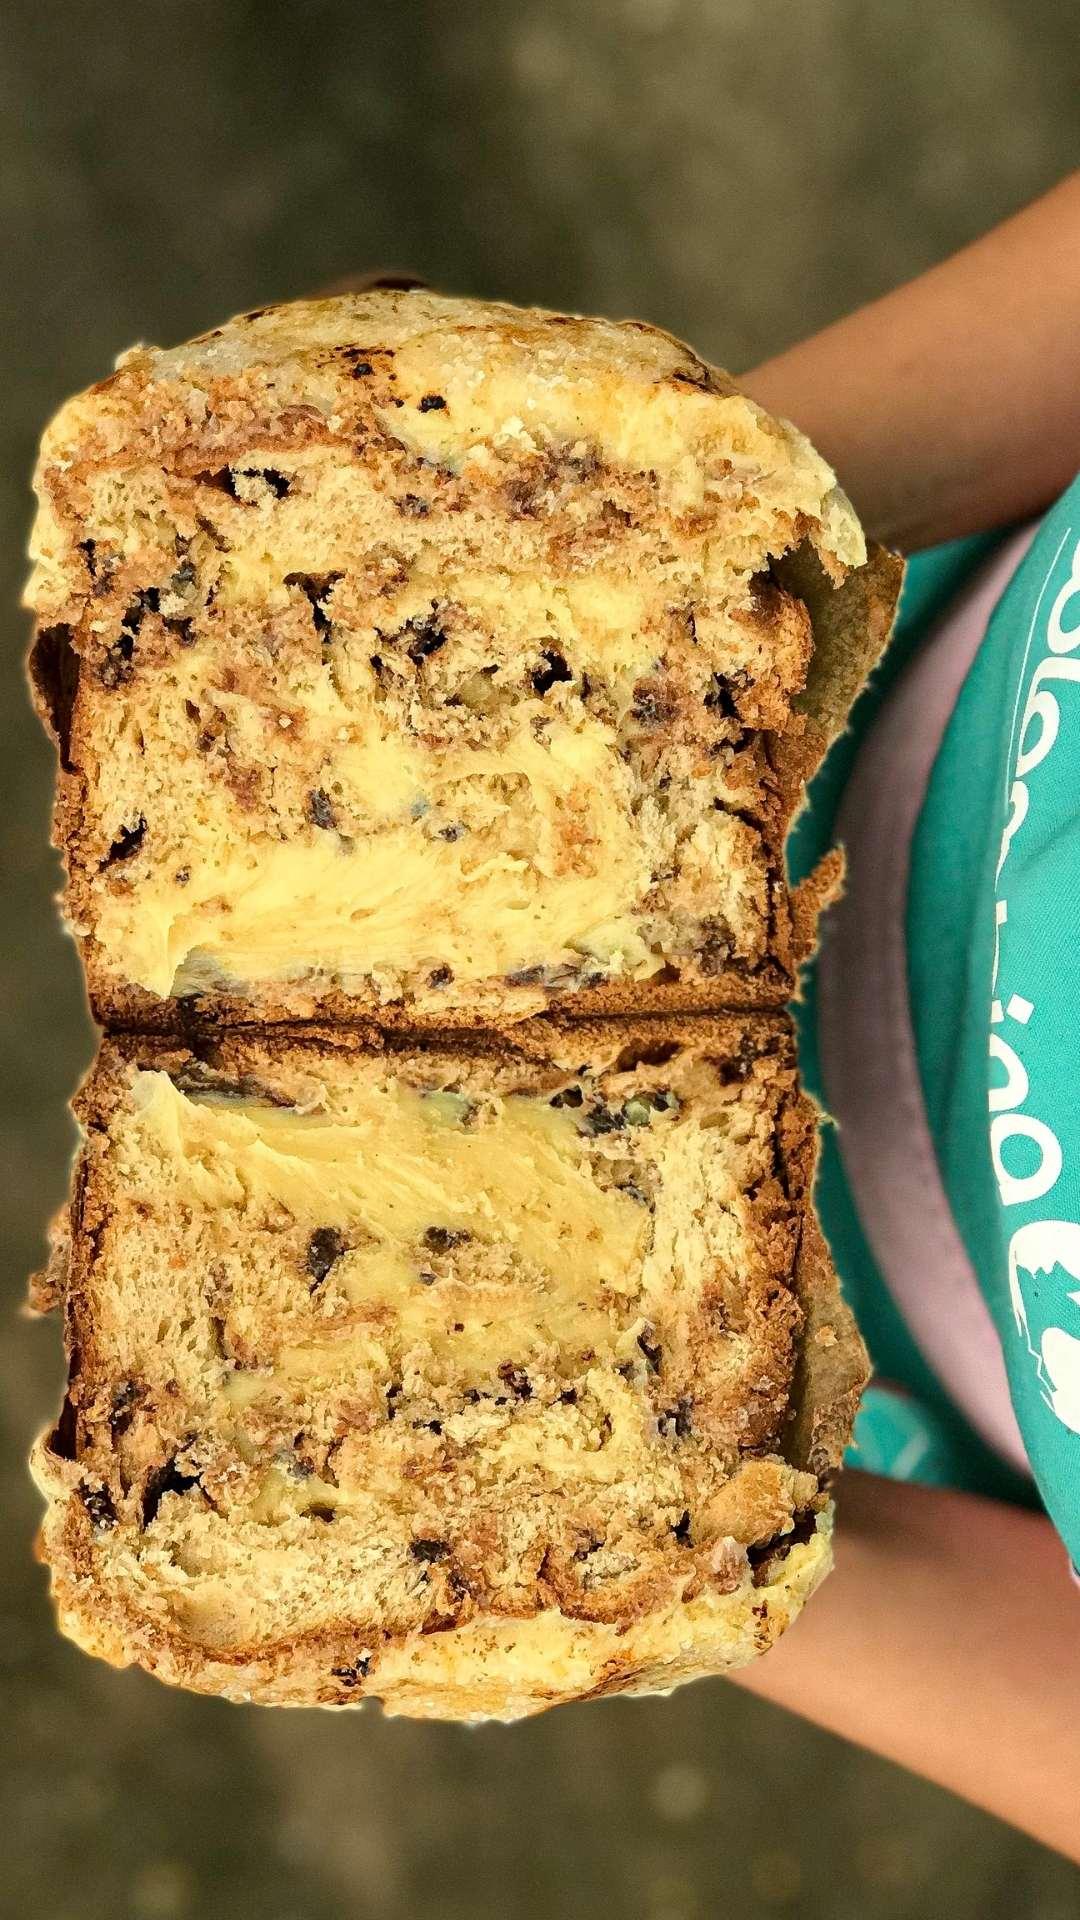 Chocottone Crème Brûlée